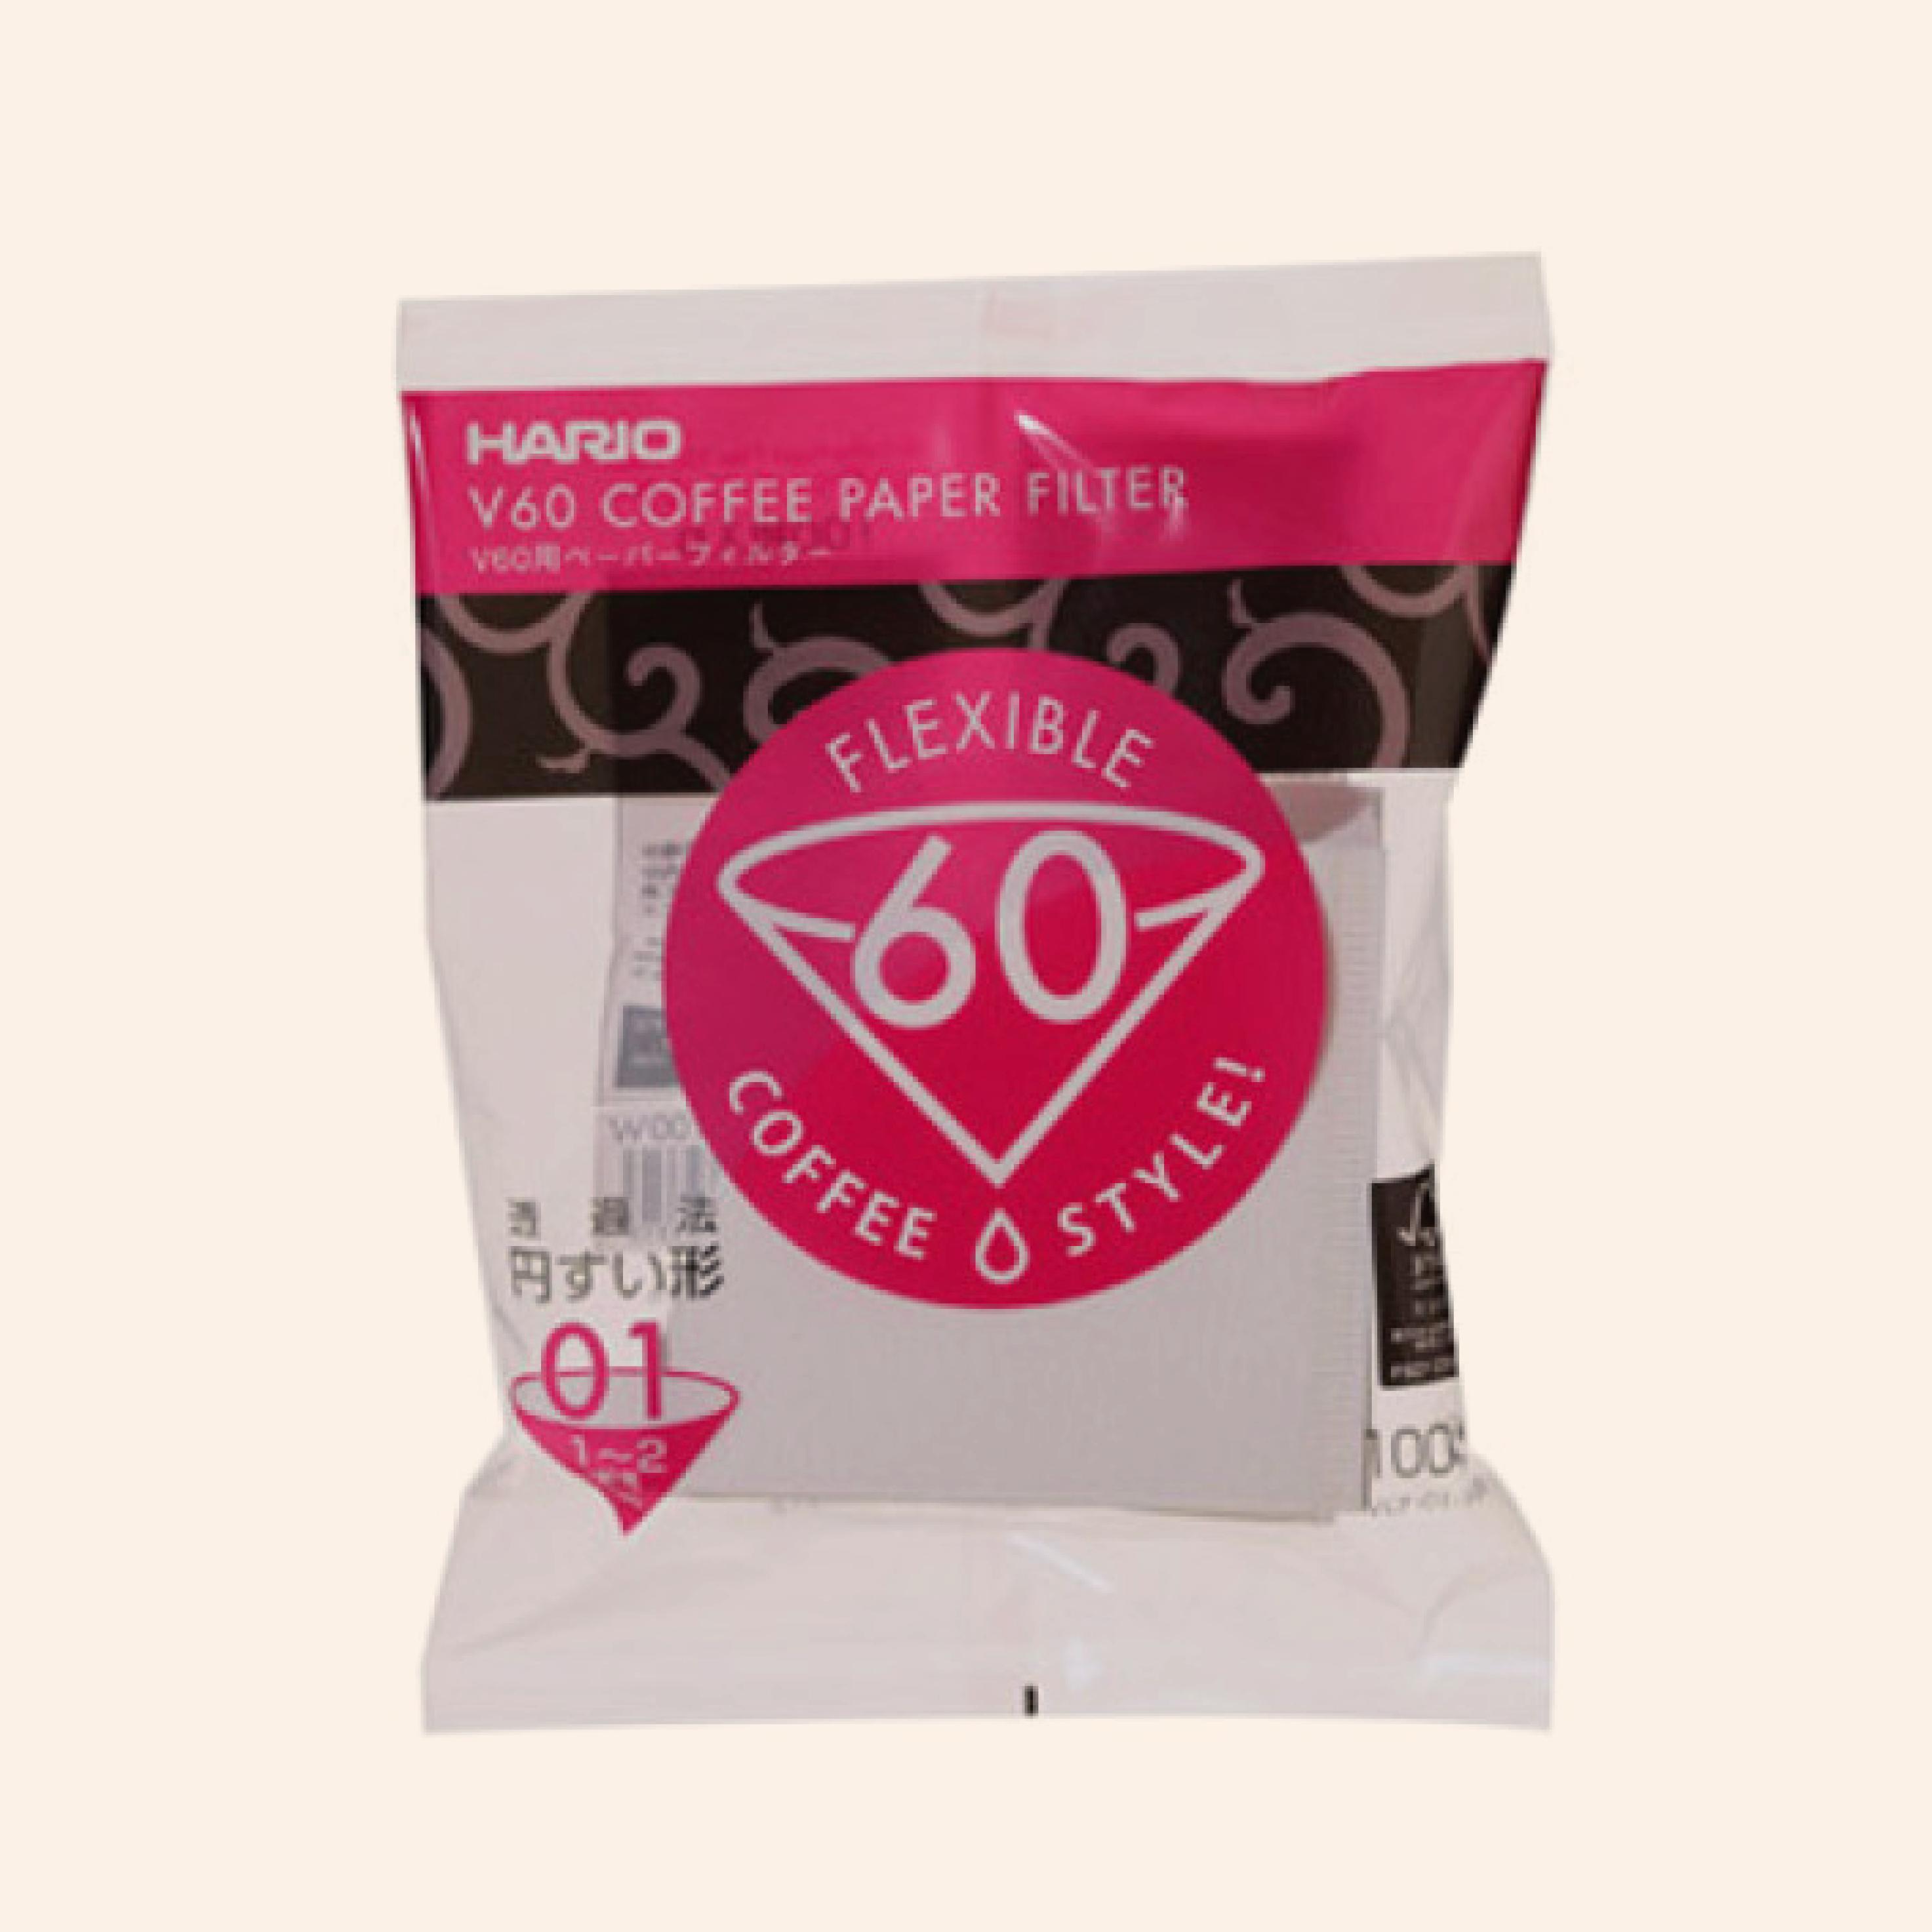 Hario V60 Filter Misarashi - 100 Stuks-02